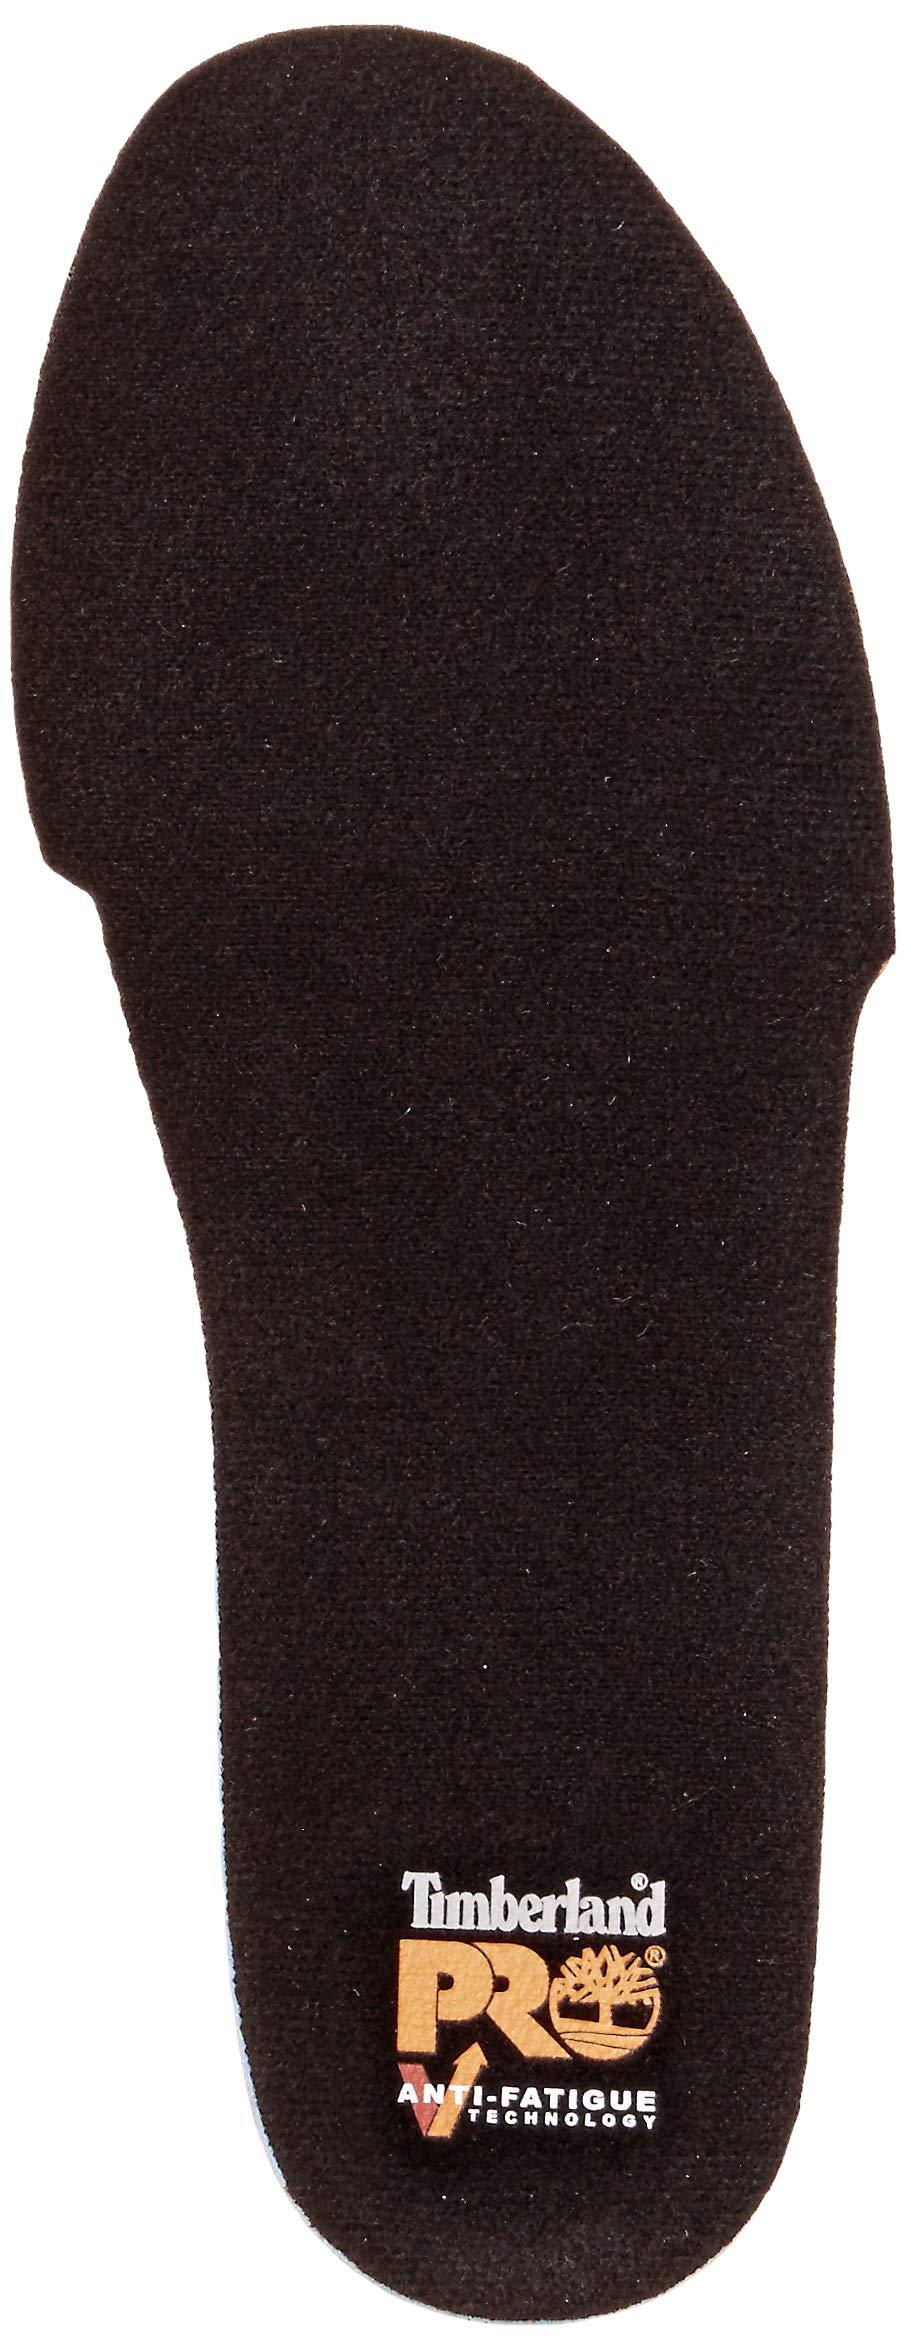 Timberland PRO Men's Anti Fatigue Technology Replacement Insole,Orange,X-Small/NA M US